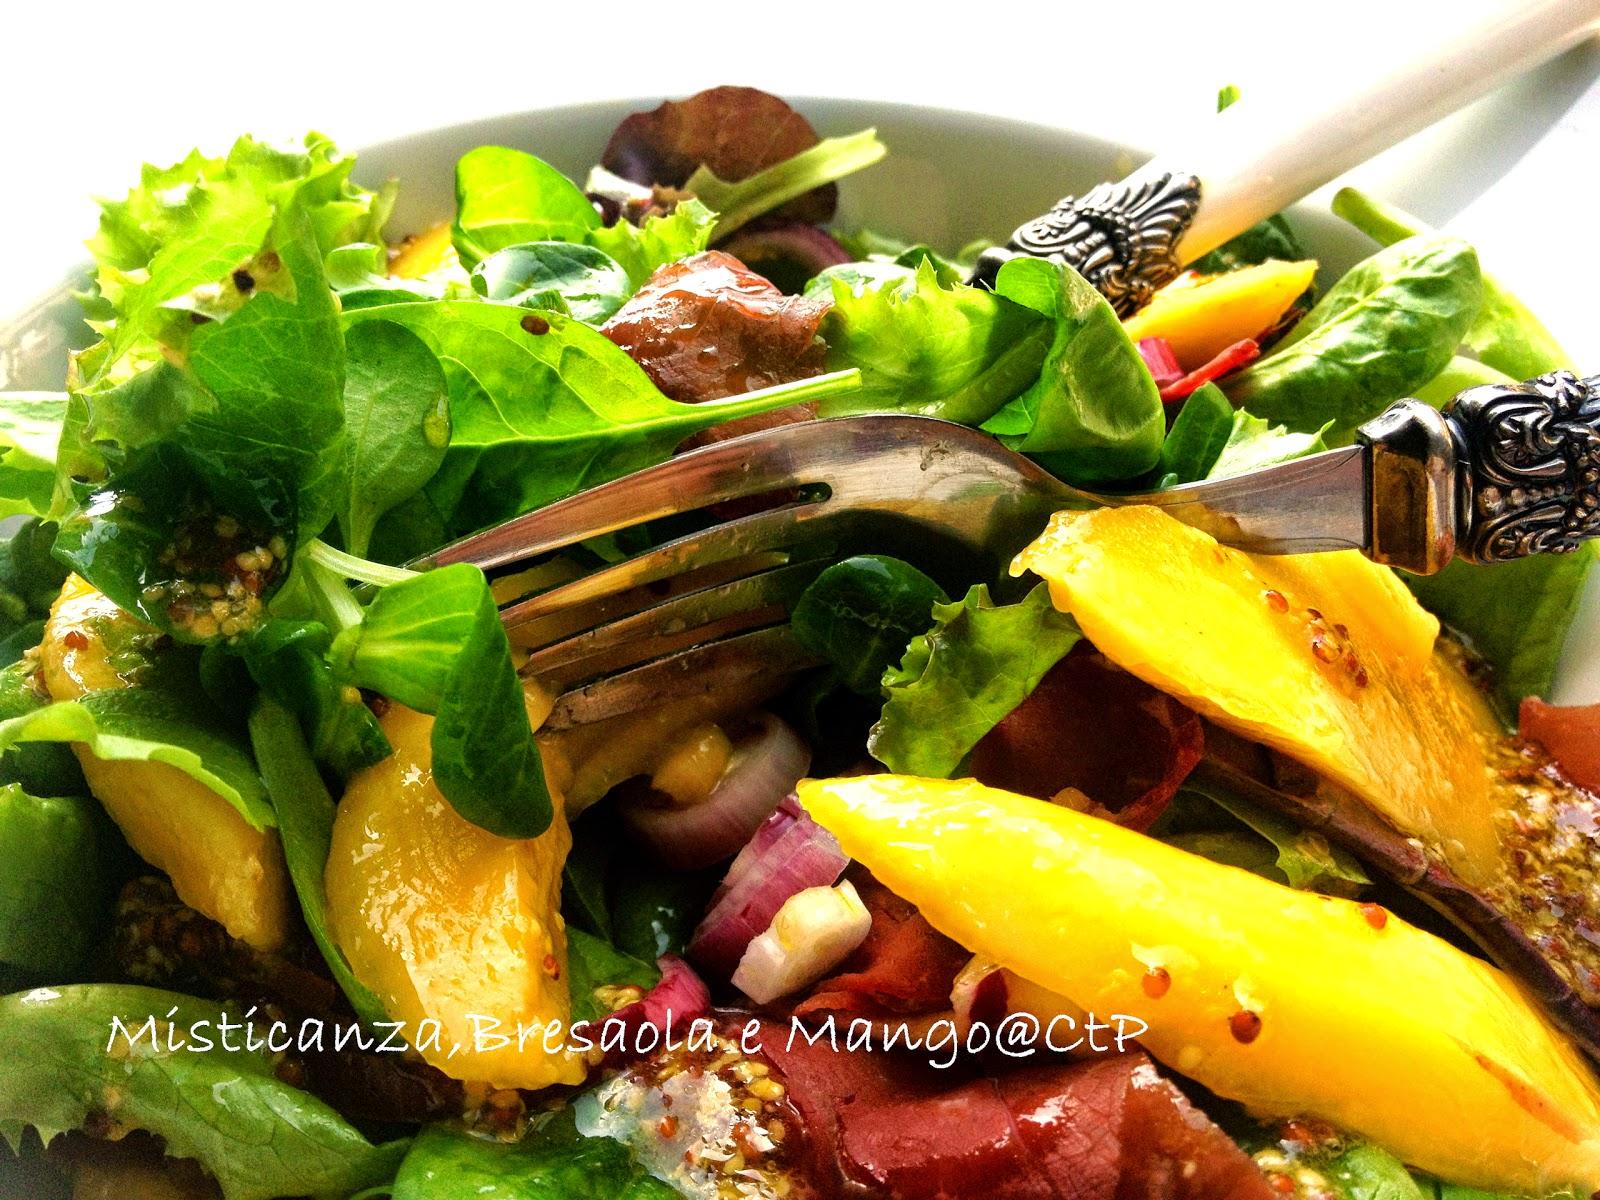 insalata mistcanza bresaola mango olio extra vergine di oliva senape